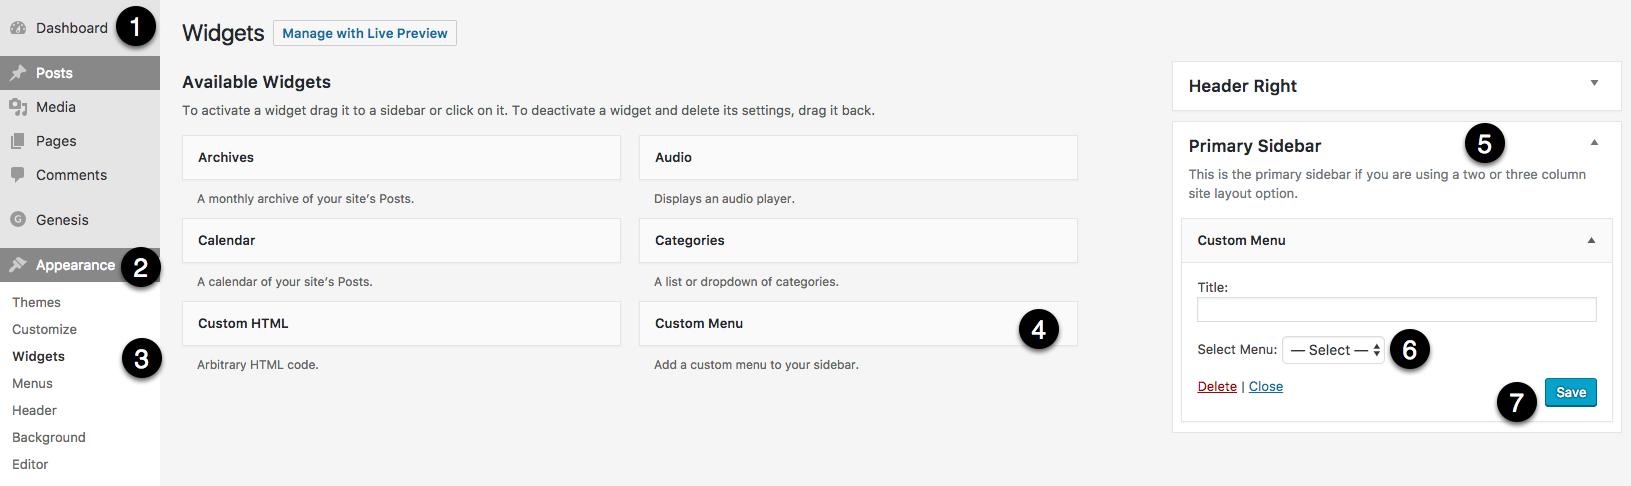 how to create sidebar menu in wordpress